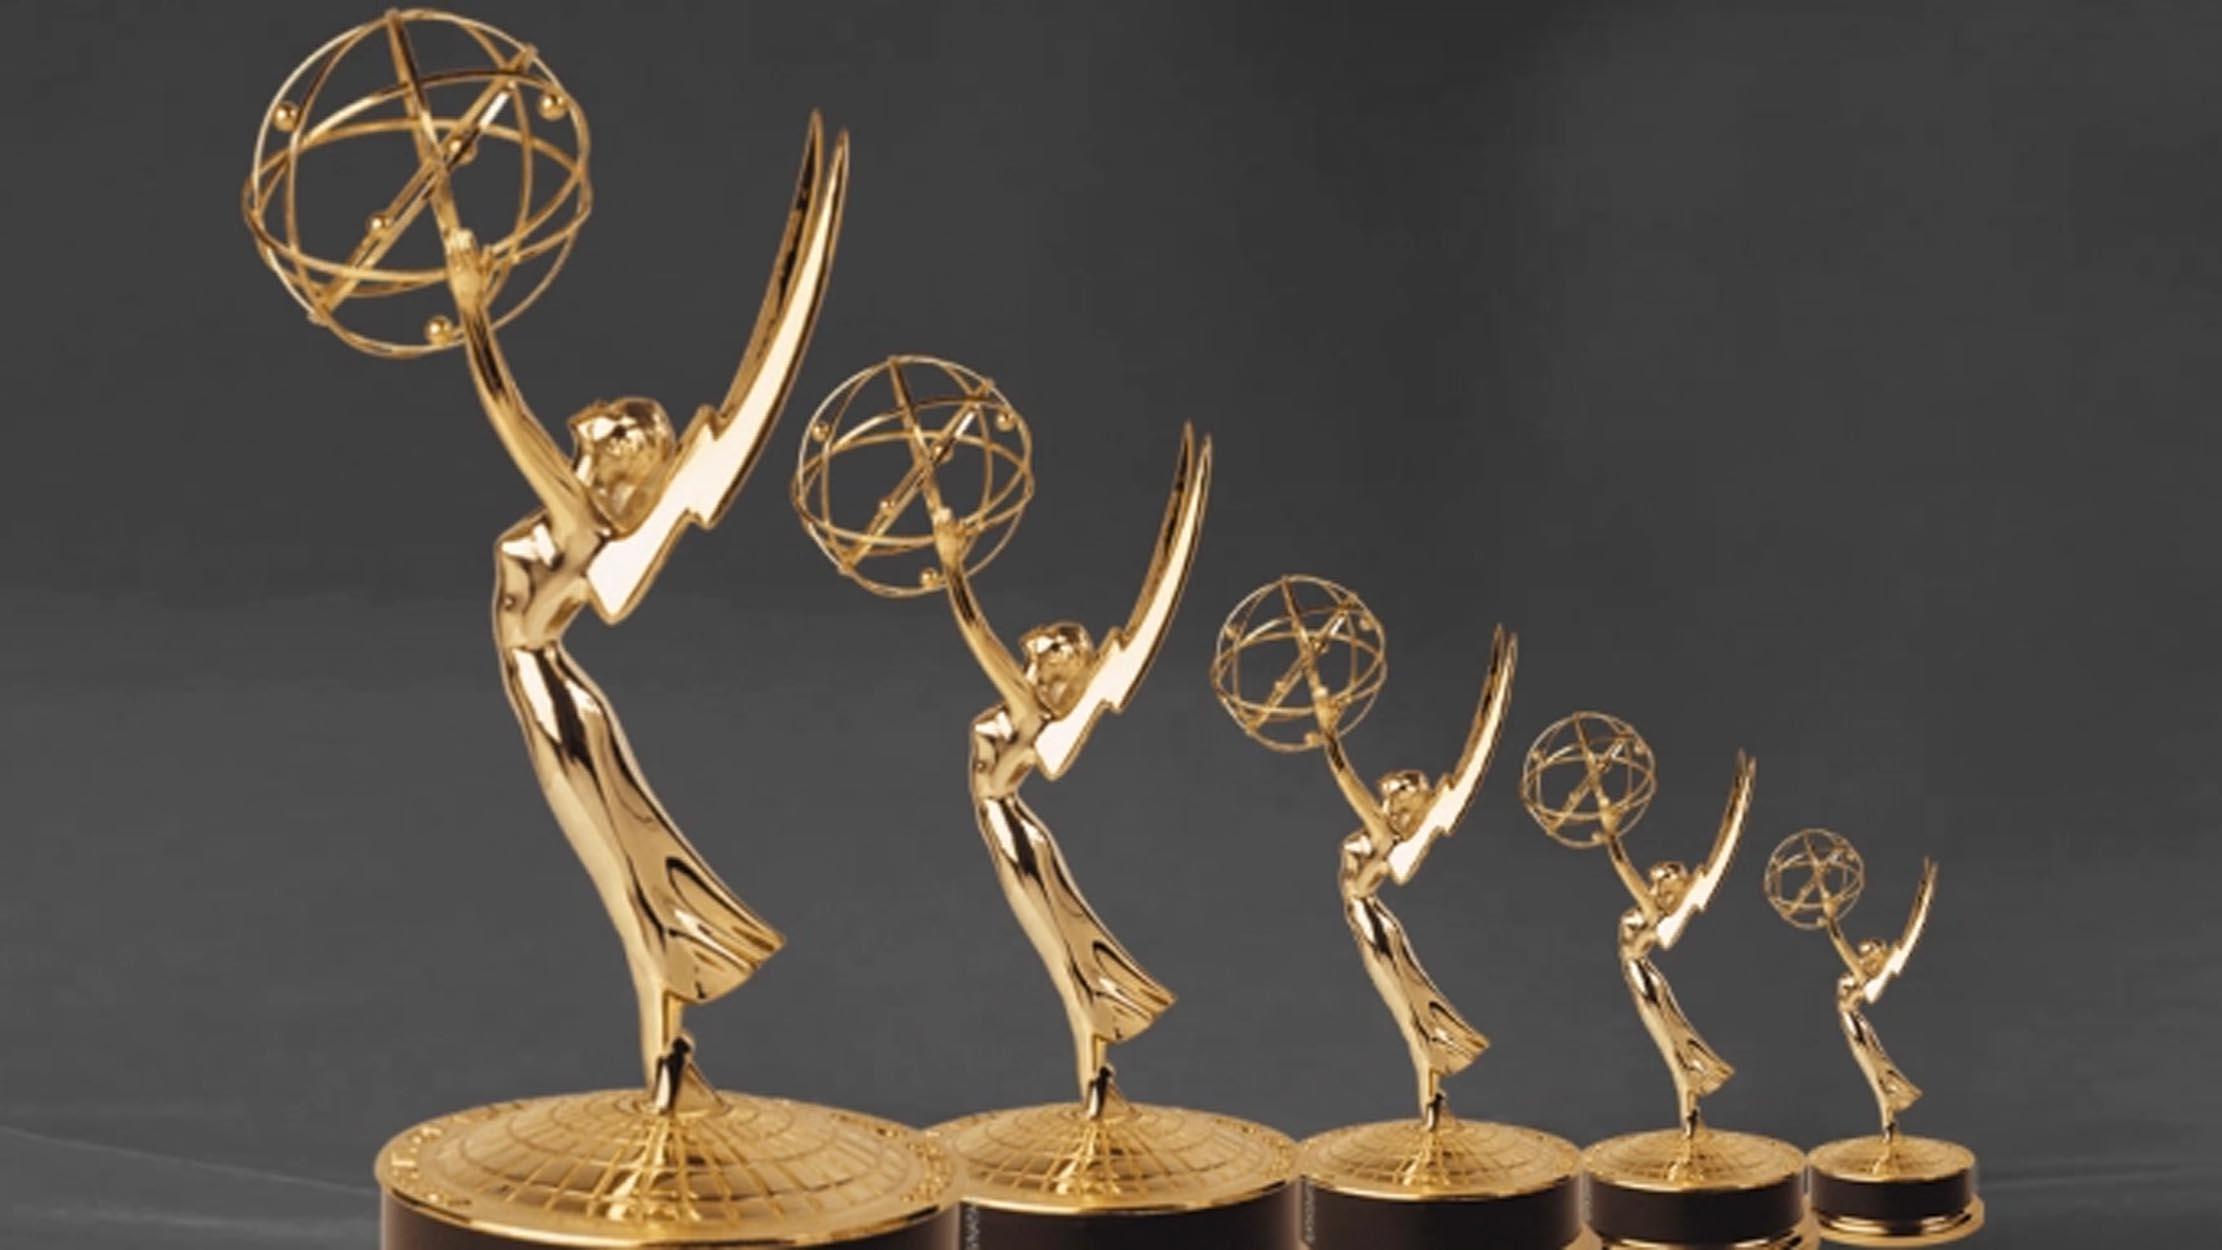 Emmy Awards 2021 fra L.A. Live (Television Academy)